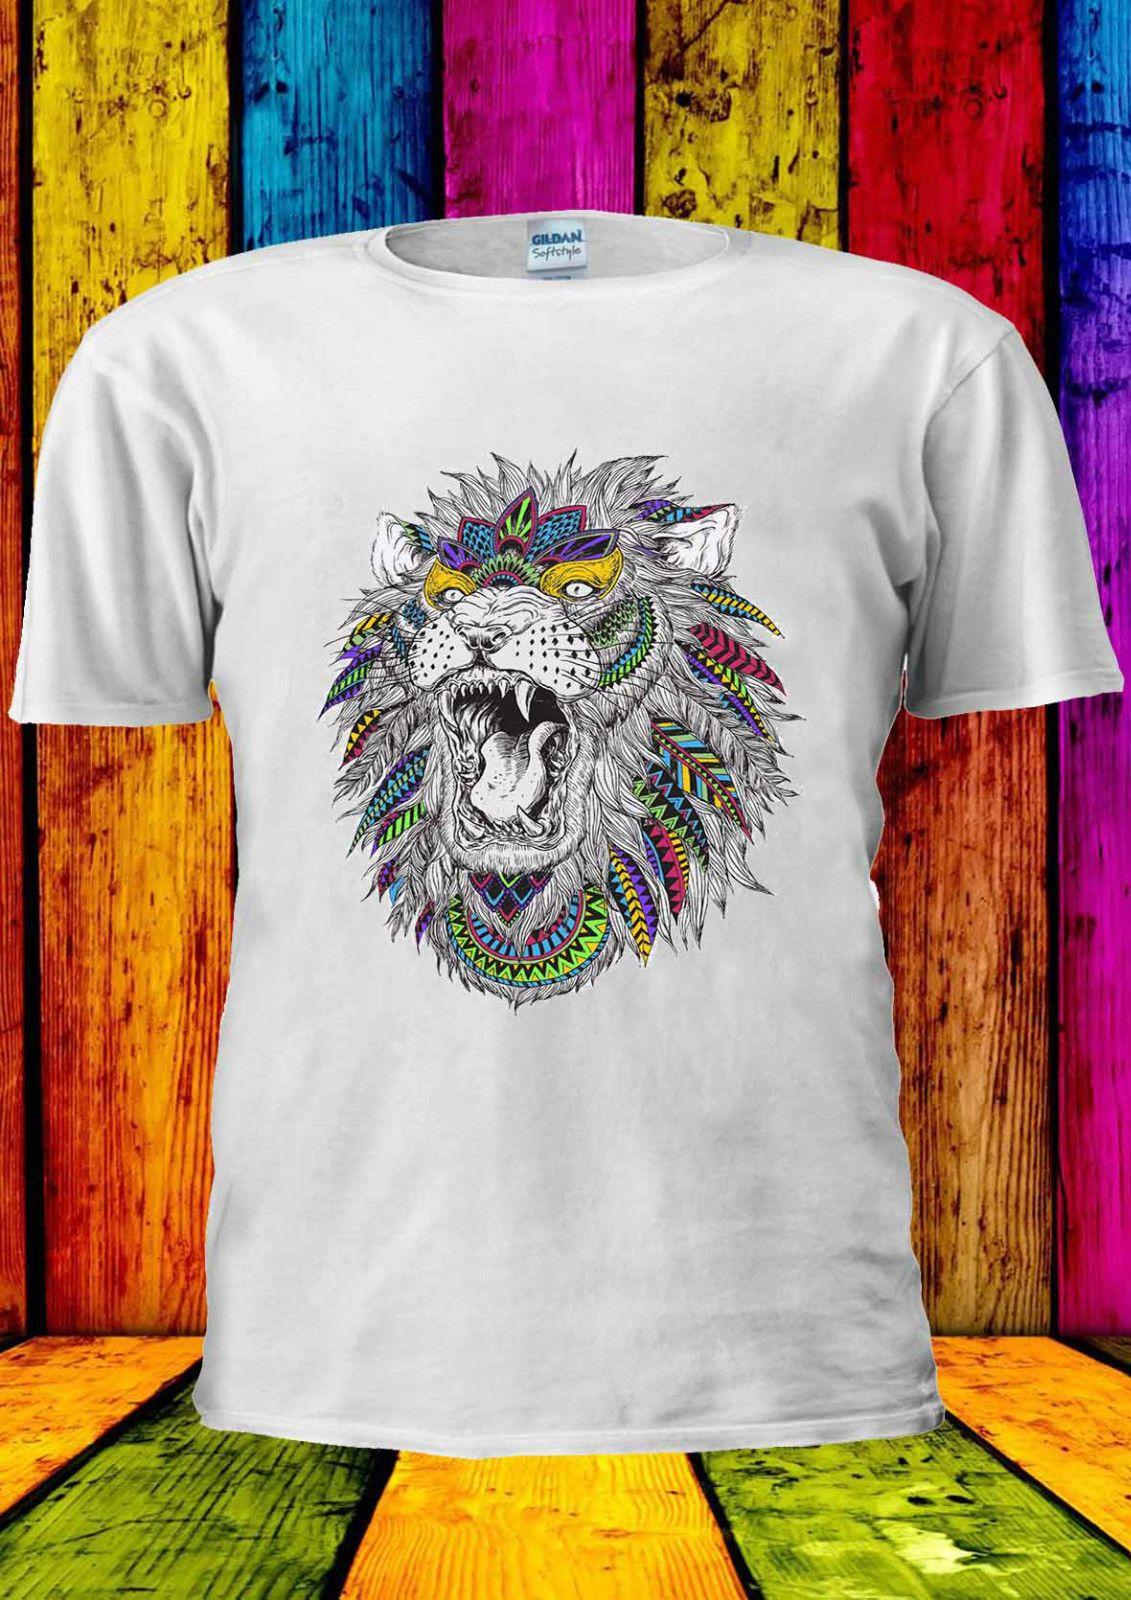 b040326b1 Abstract Lion Roaring Fashion Tumblr T Shirt Vest Tank Top Men Women Unisex  2120 Cheap Tee Fashion Style Men Tee Designs Shirts Interesting T Shirt  Designs ...